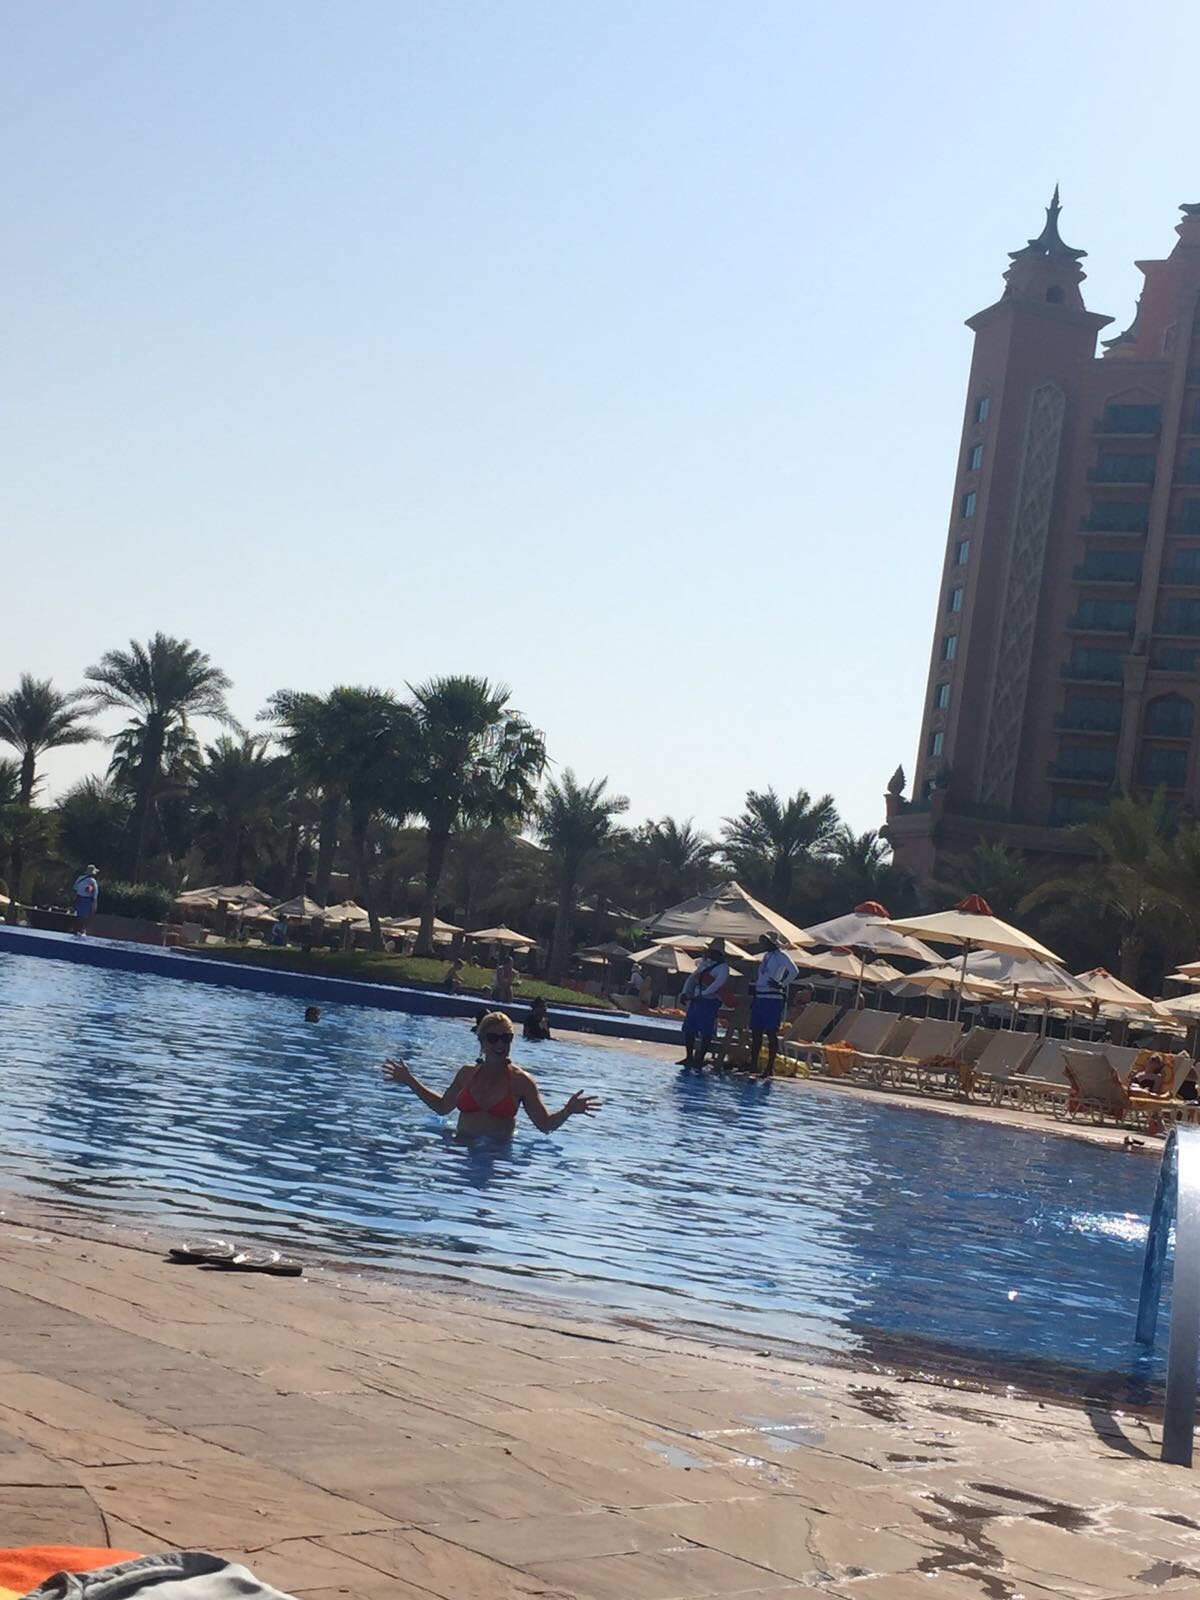 Anna Kooiman dubai atlantis united arab emirates travel fitness lifestyle style fashion annakooiman.com gordon ramsay waterpark aquarium desert adventure